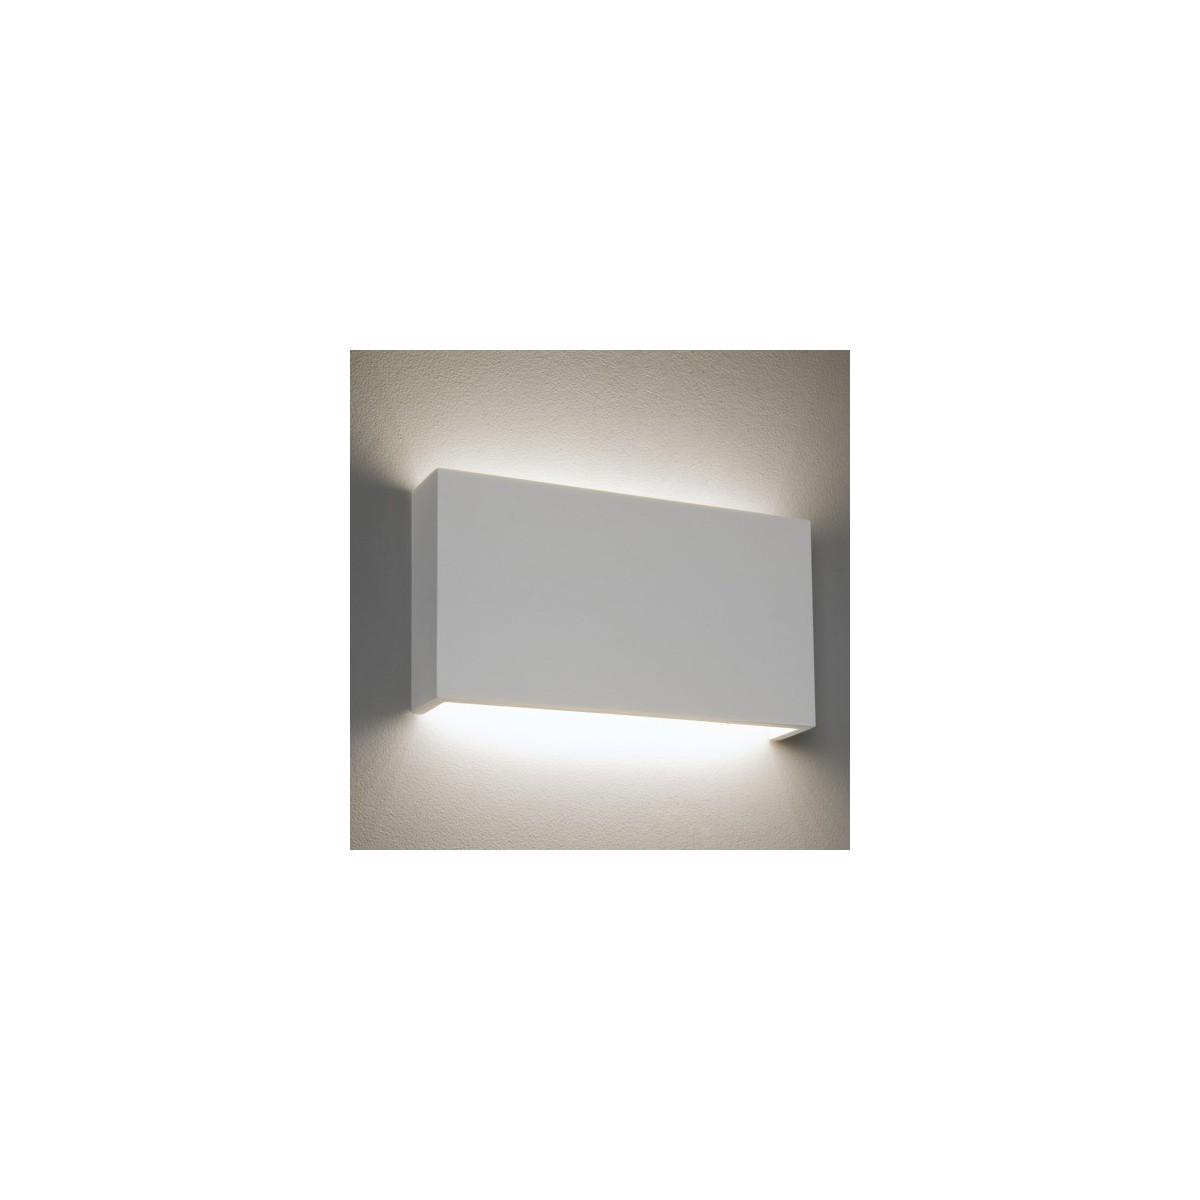 Astro Rio 325 LED 3000K Ścienna 14.7W LED Gips 1325001